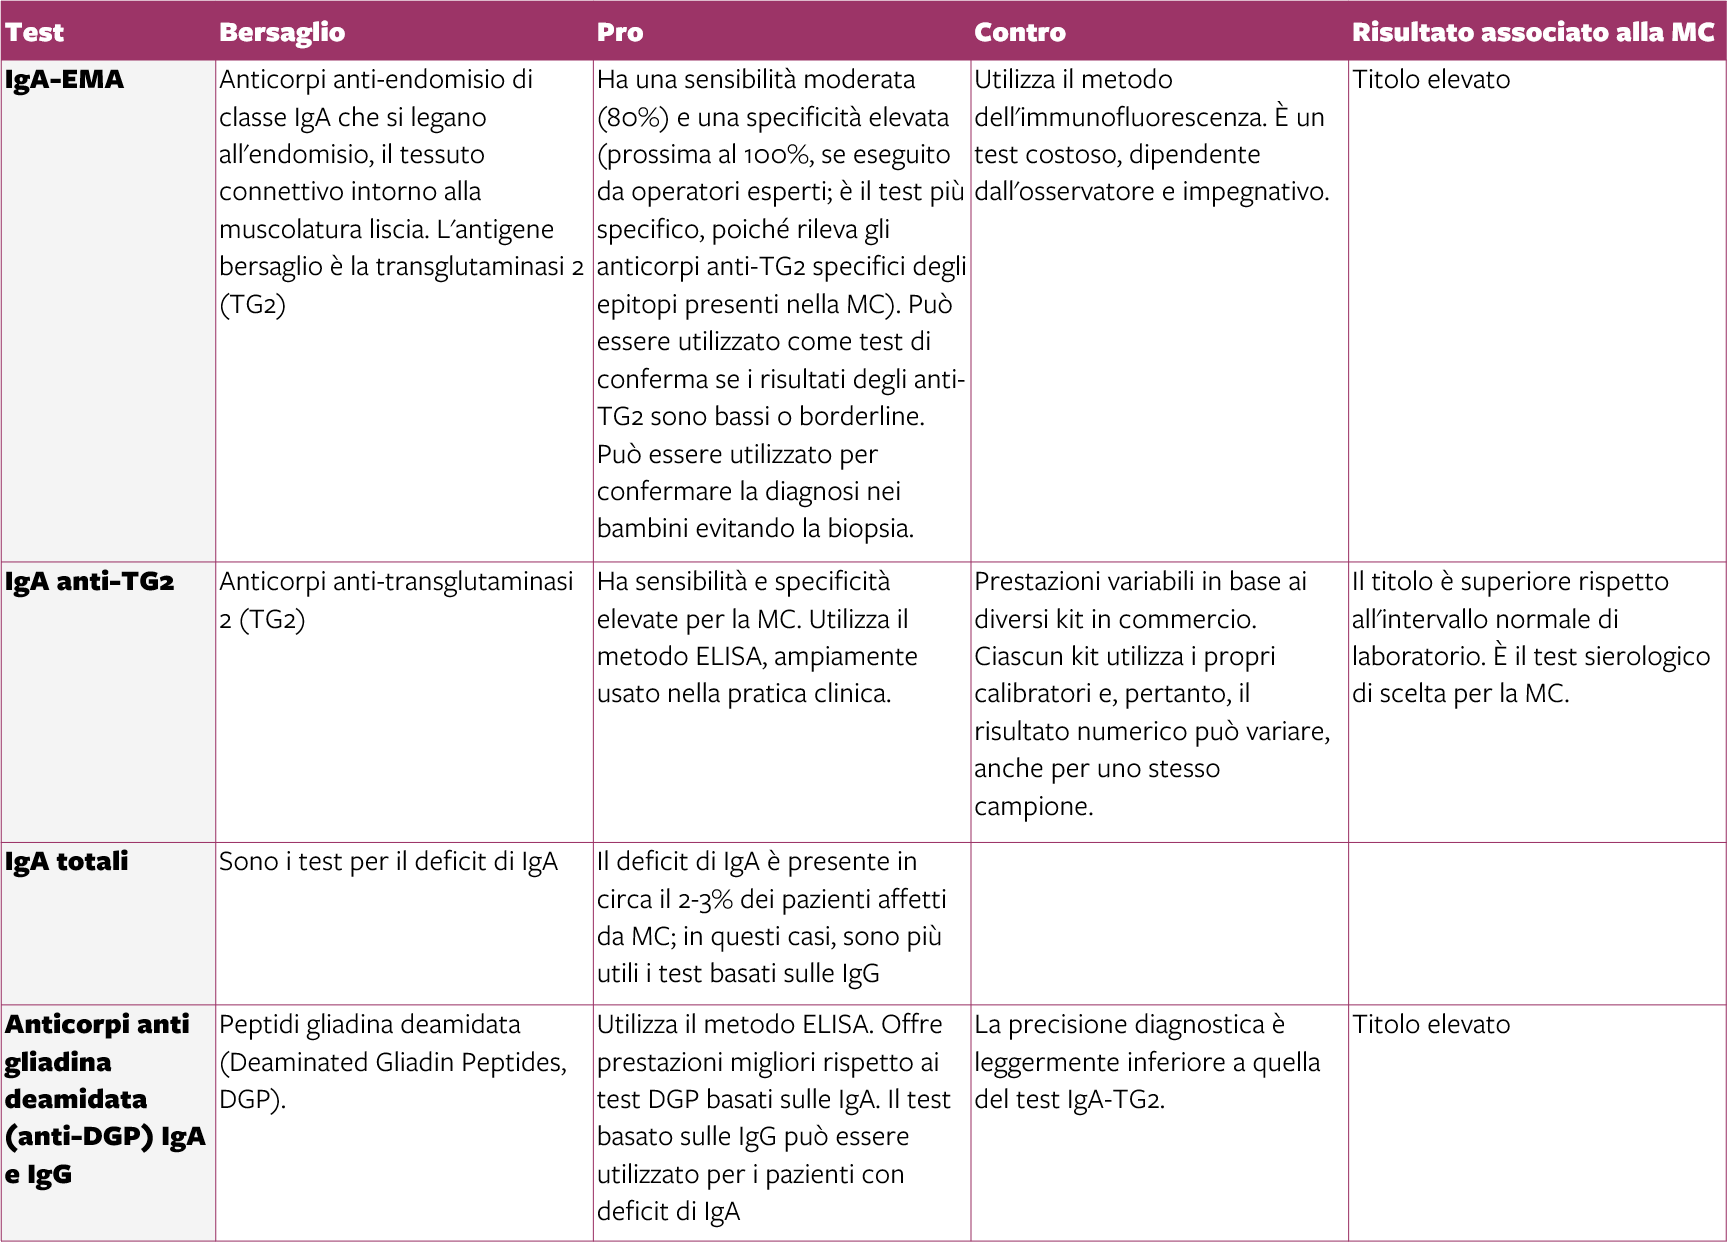 tavola • Test sierologici per la MC